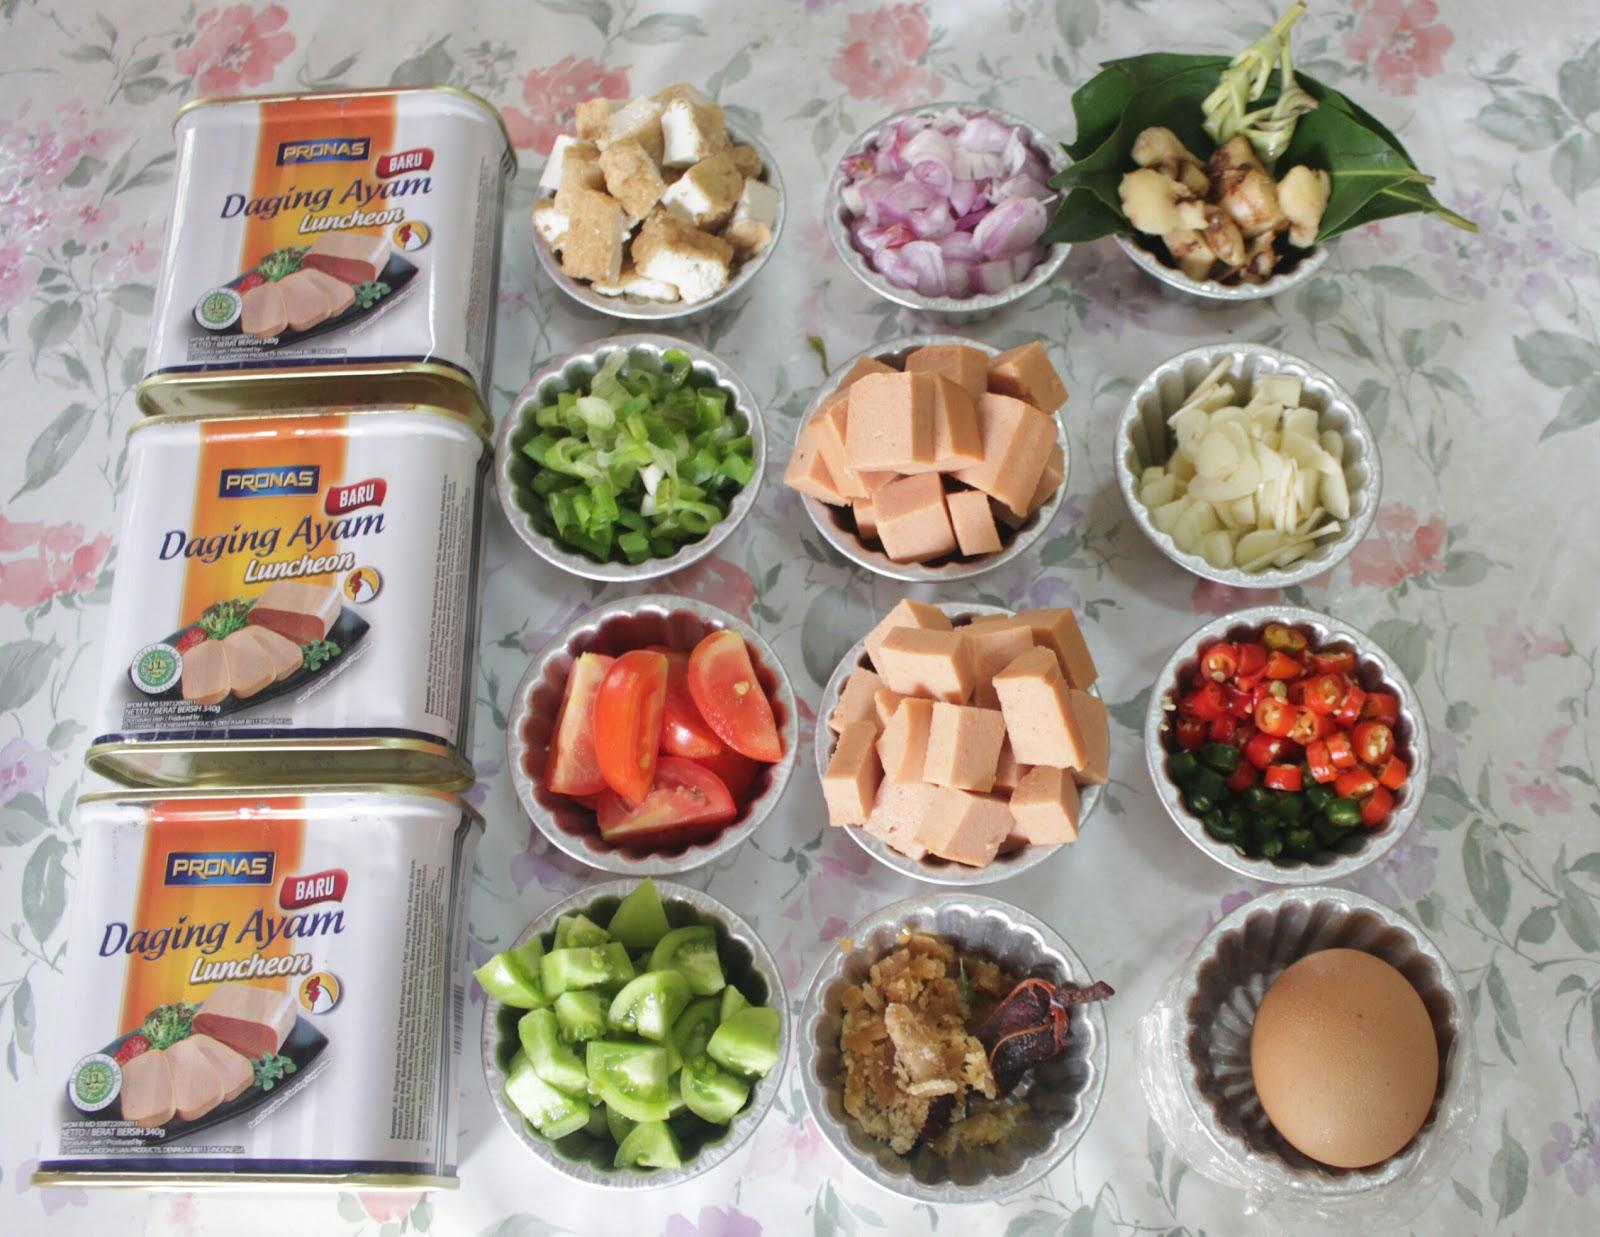 Juni 2018 Cerita Kokidol Pronas Kari Ayam 1 2 Kaleng Daging Luncheon Potong Dadu 5 Siung Bawang Putih Iris 7 Butir Merah Buah Cabe Ijo